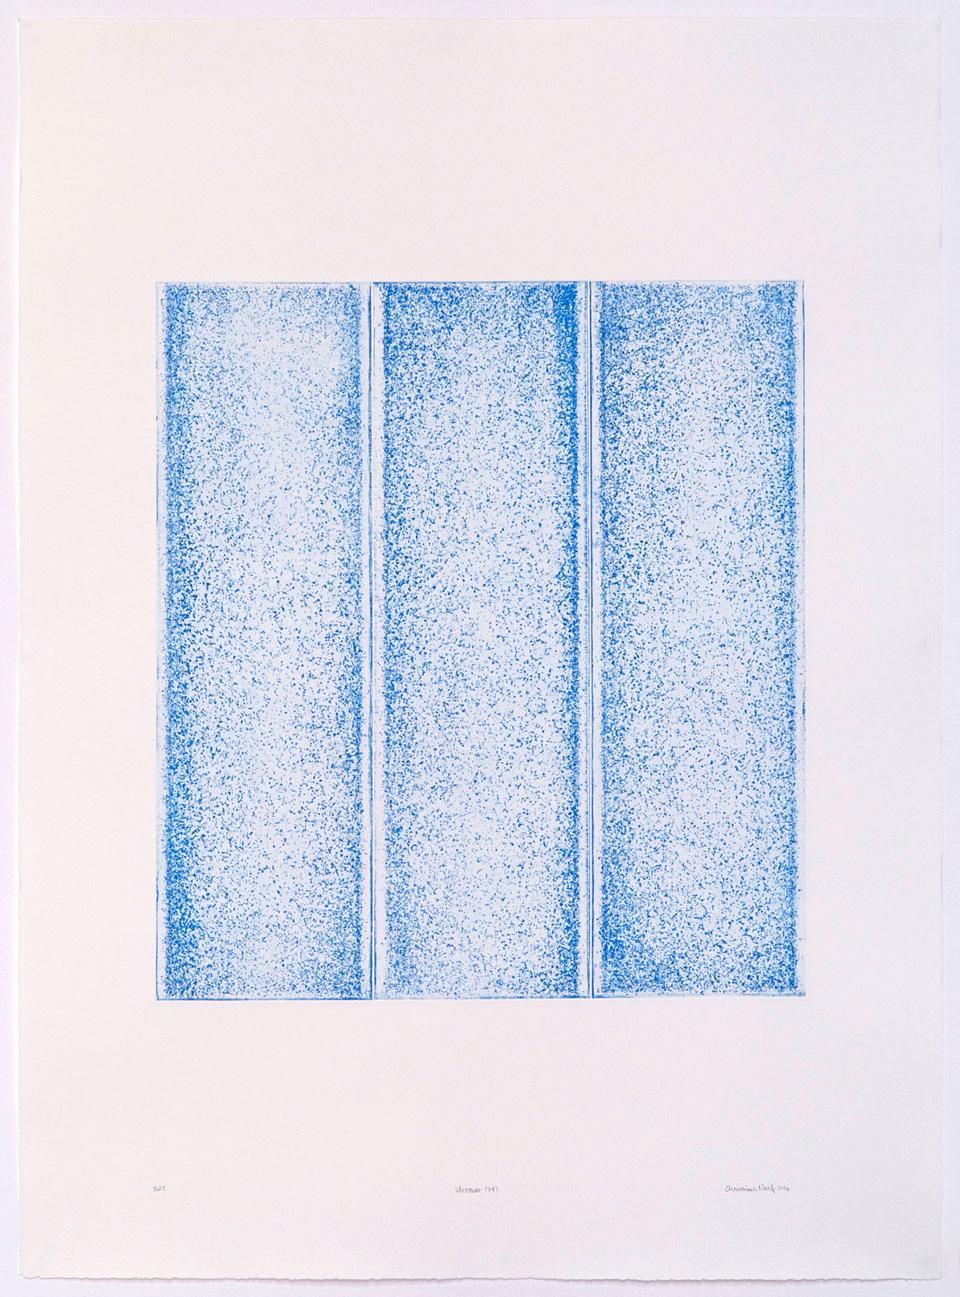 Christian Nerf überrest-79-Prints Selling R5,000.00 - R10,000.00